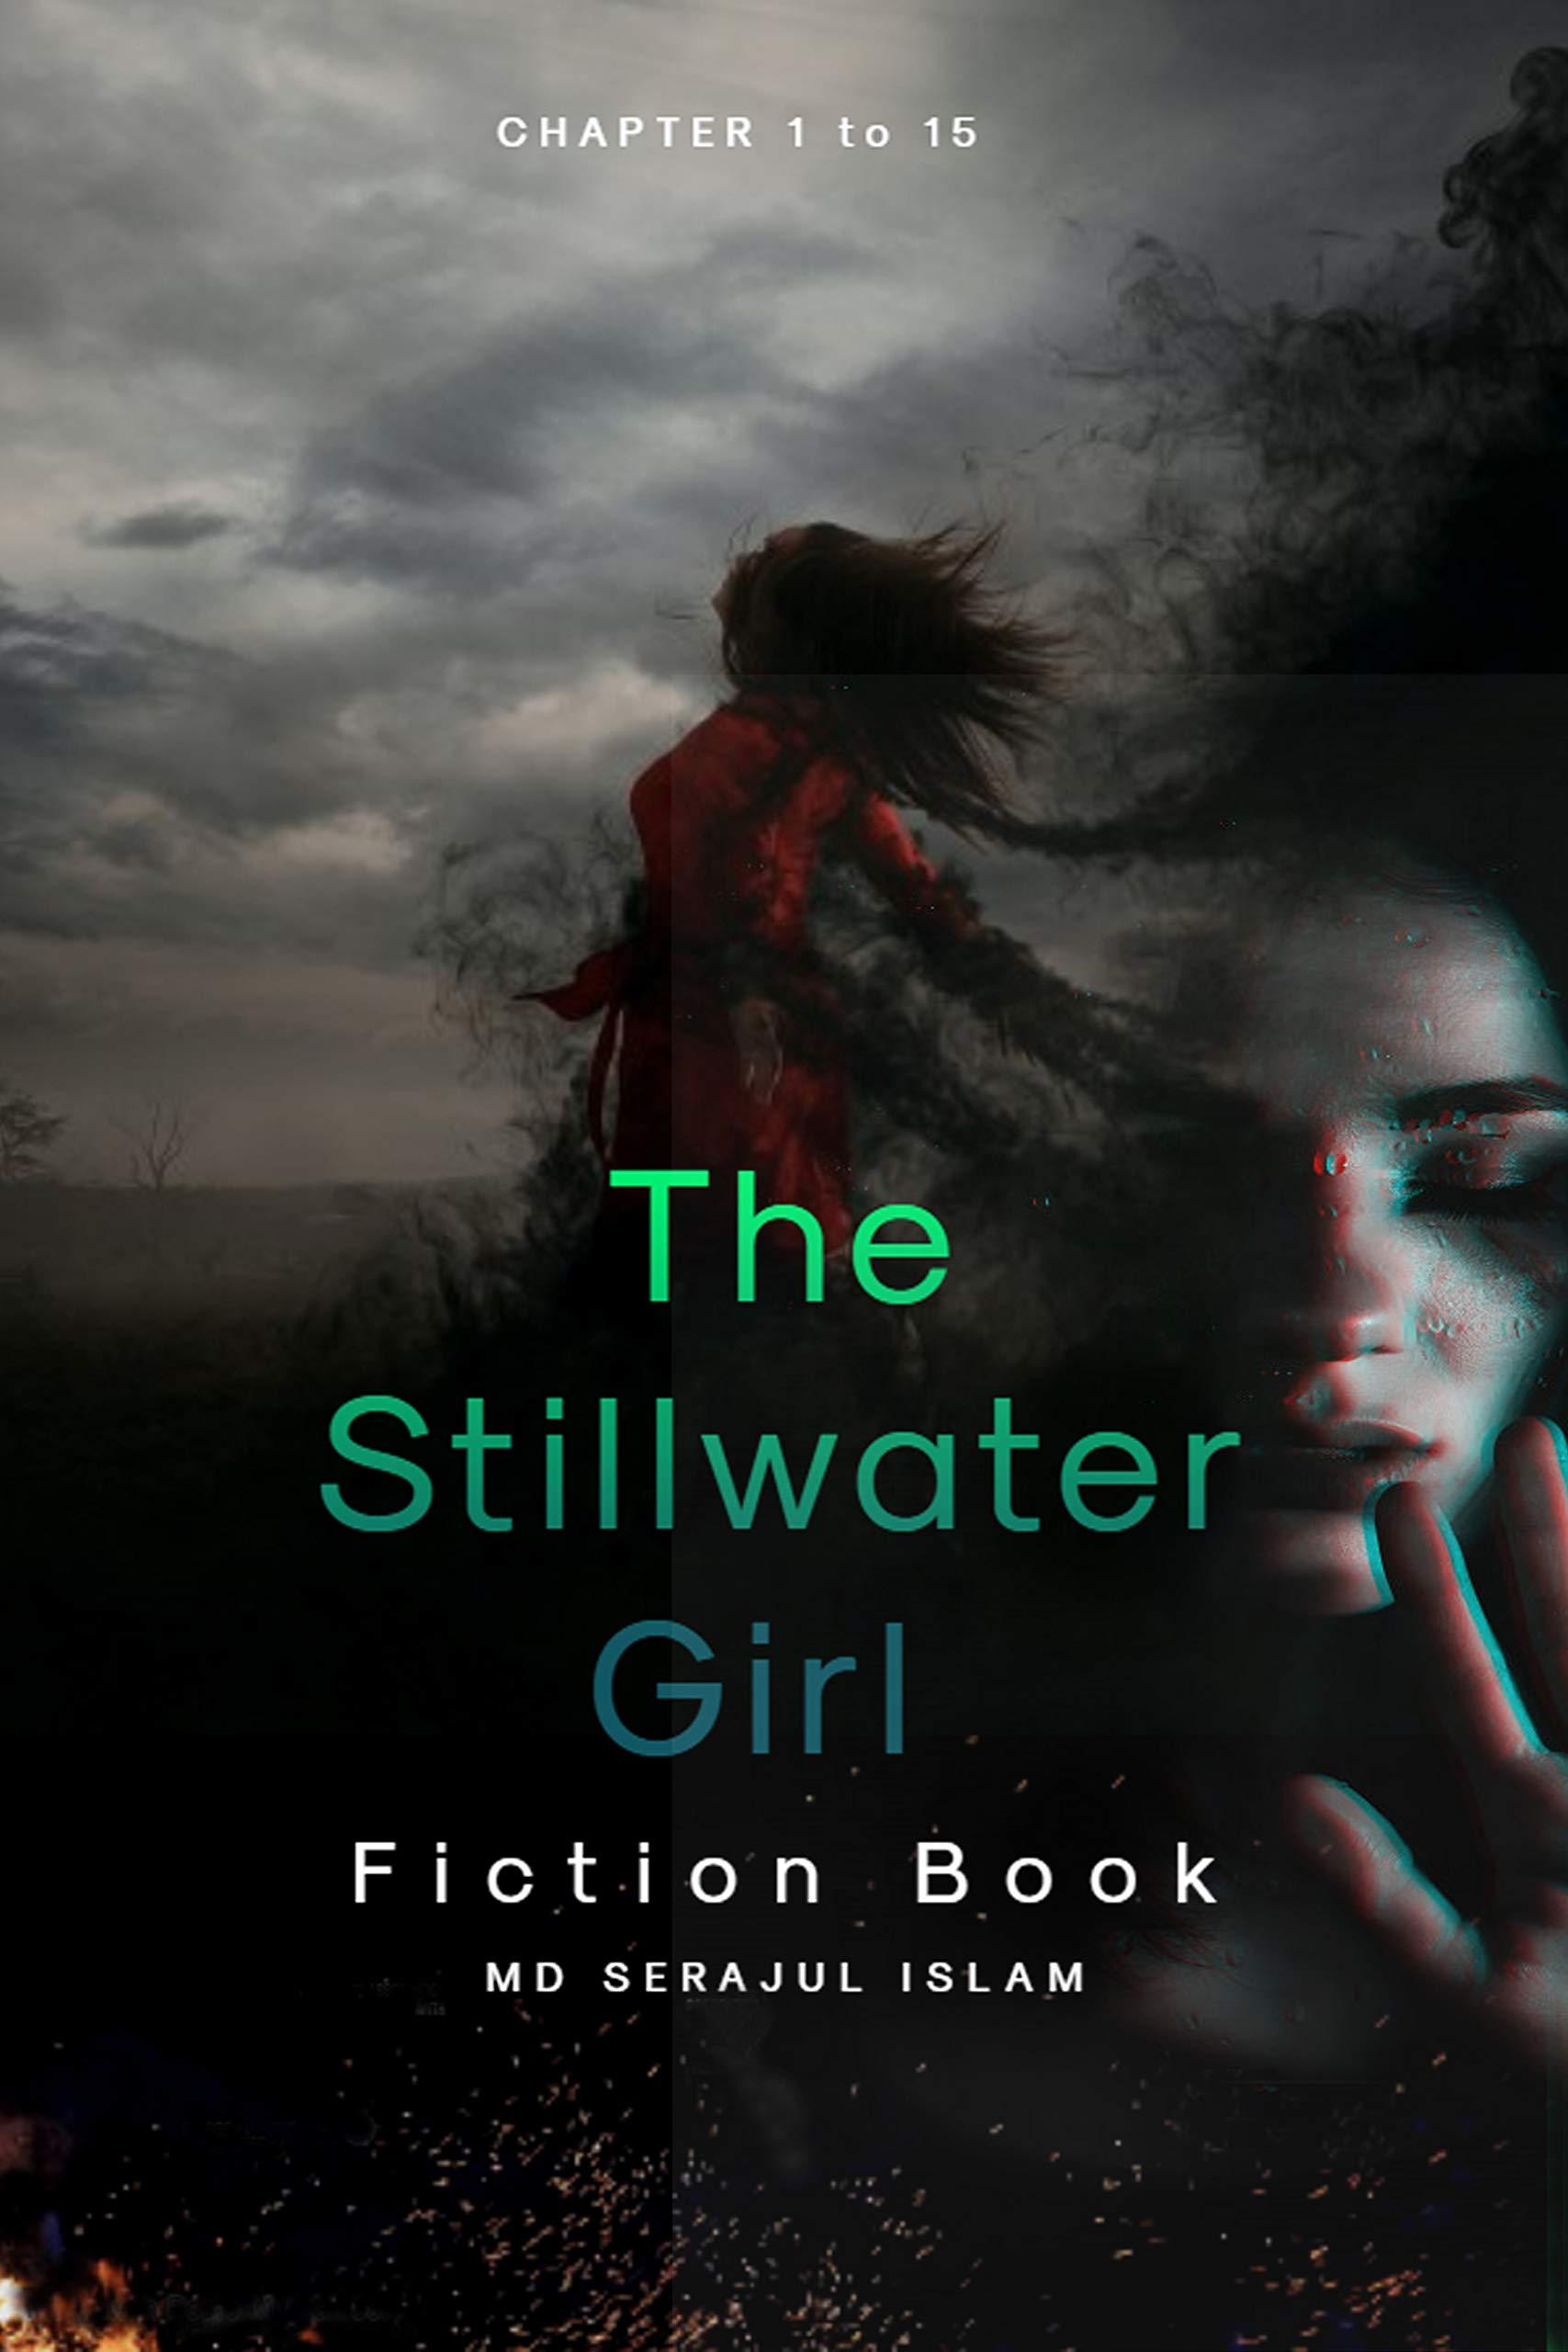 stillwater girls: The Stillwater Girl Fiction Book (Chapter 1 to 15)